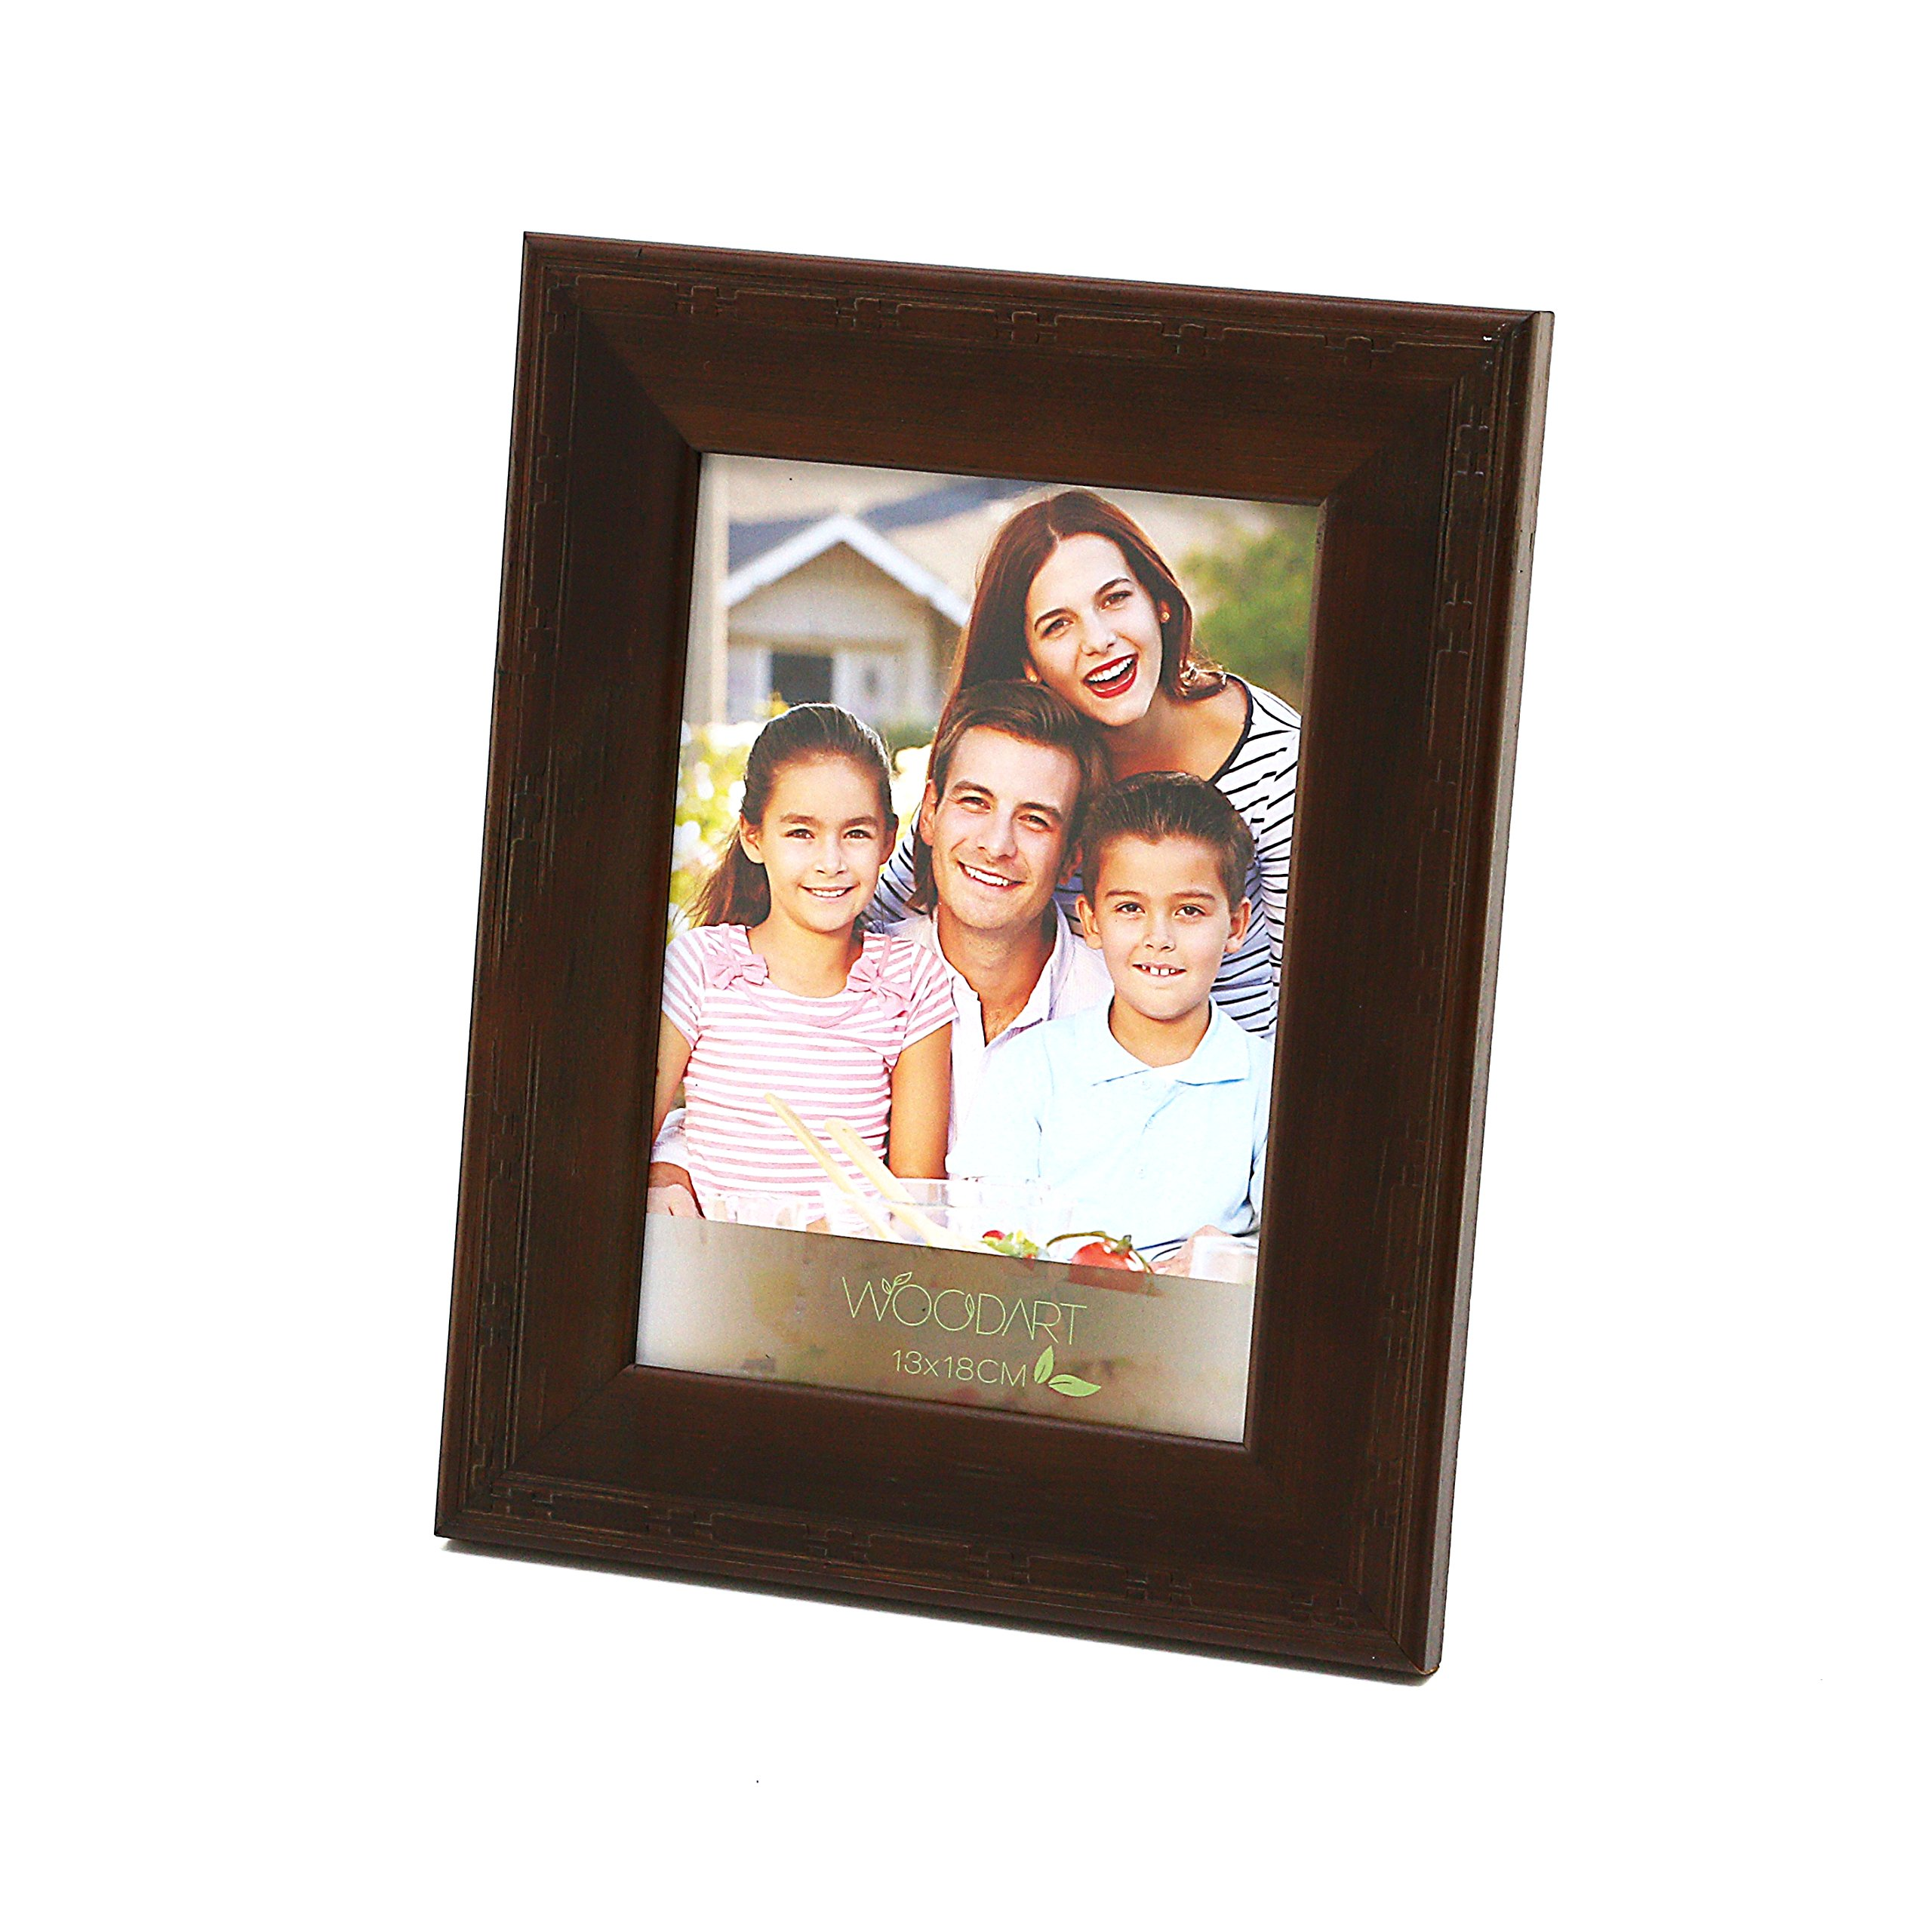 WoodArt Wooden Picture Frame (5x7'', Dark Wood)